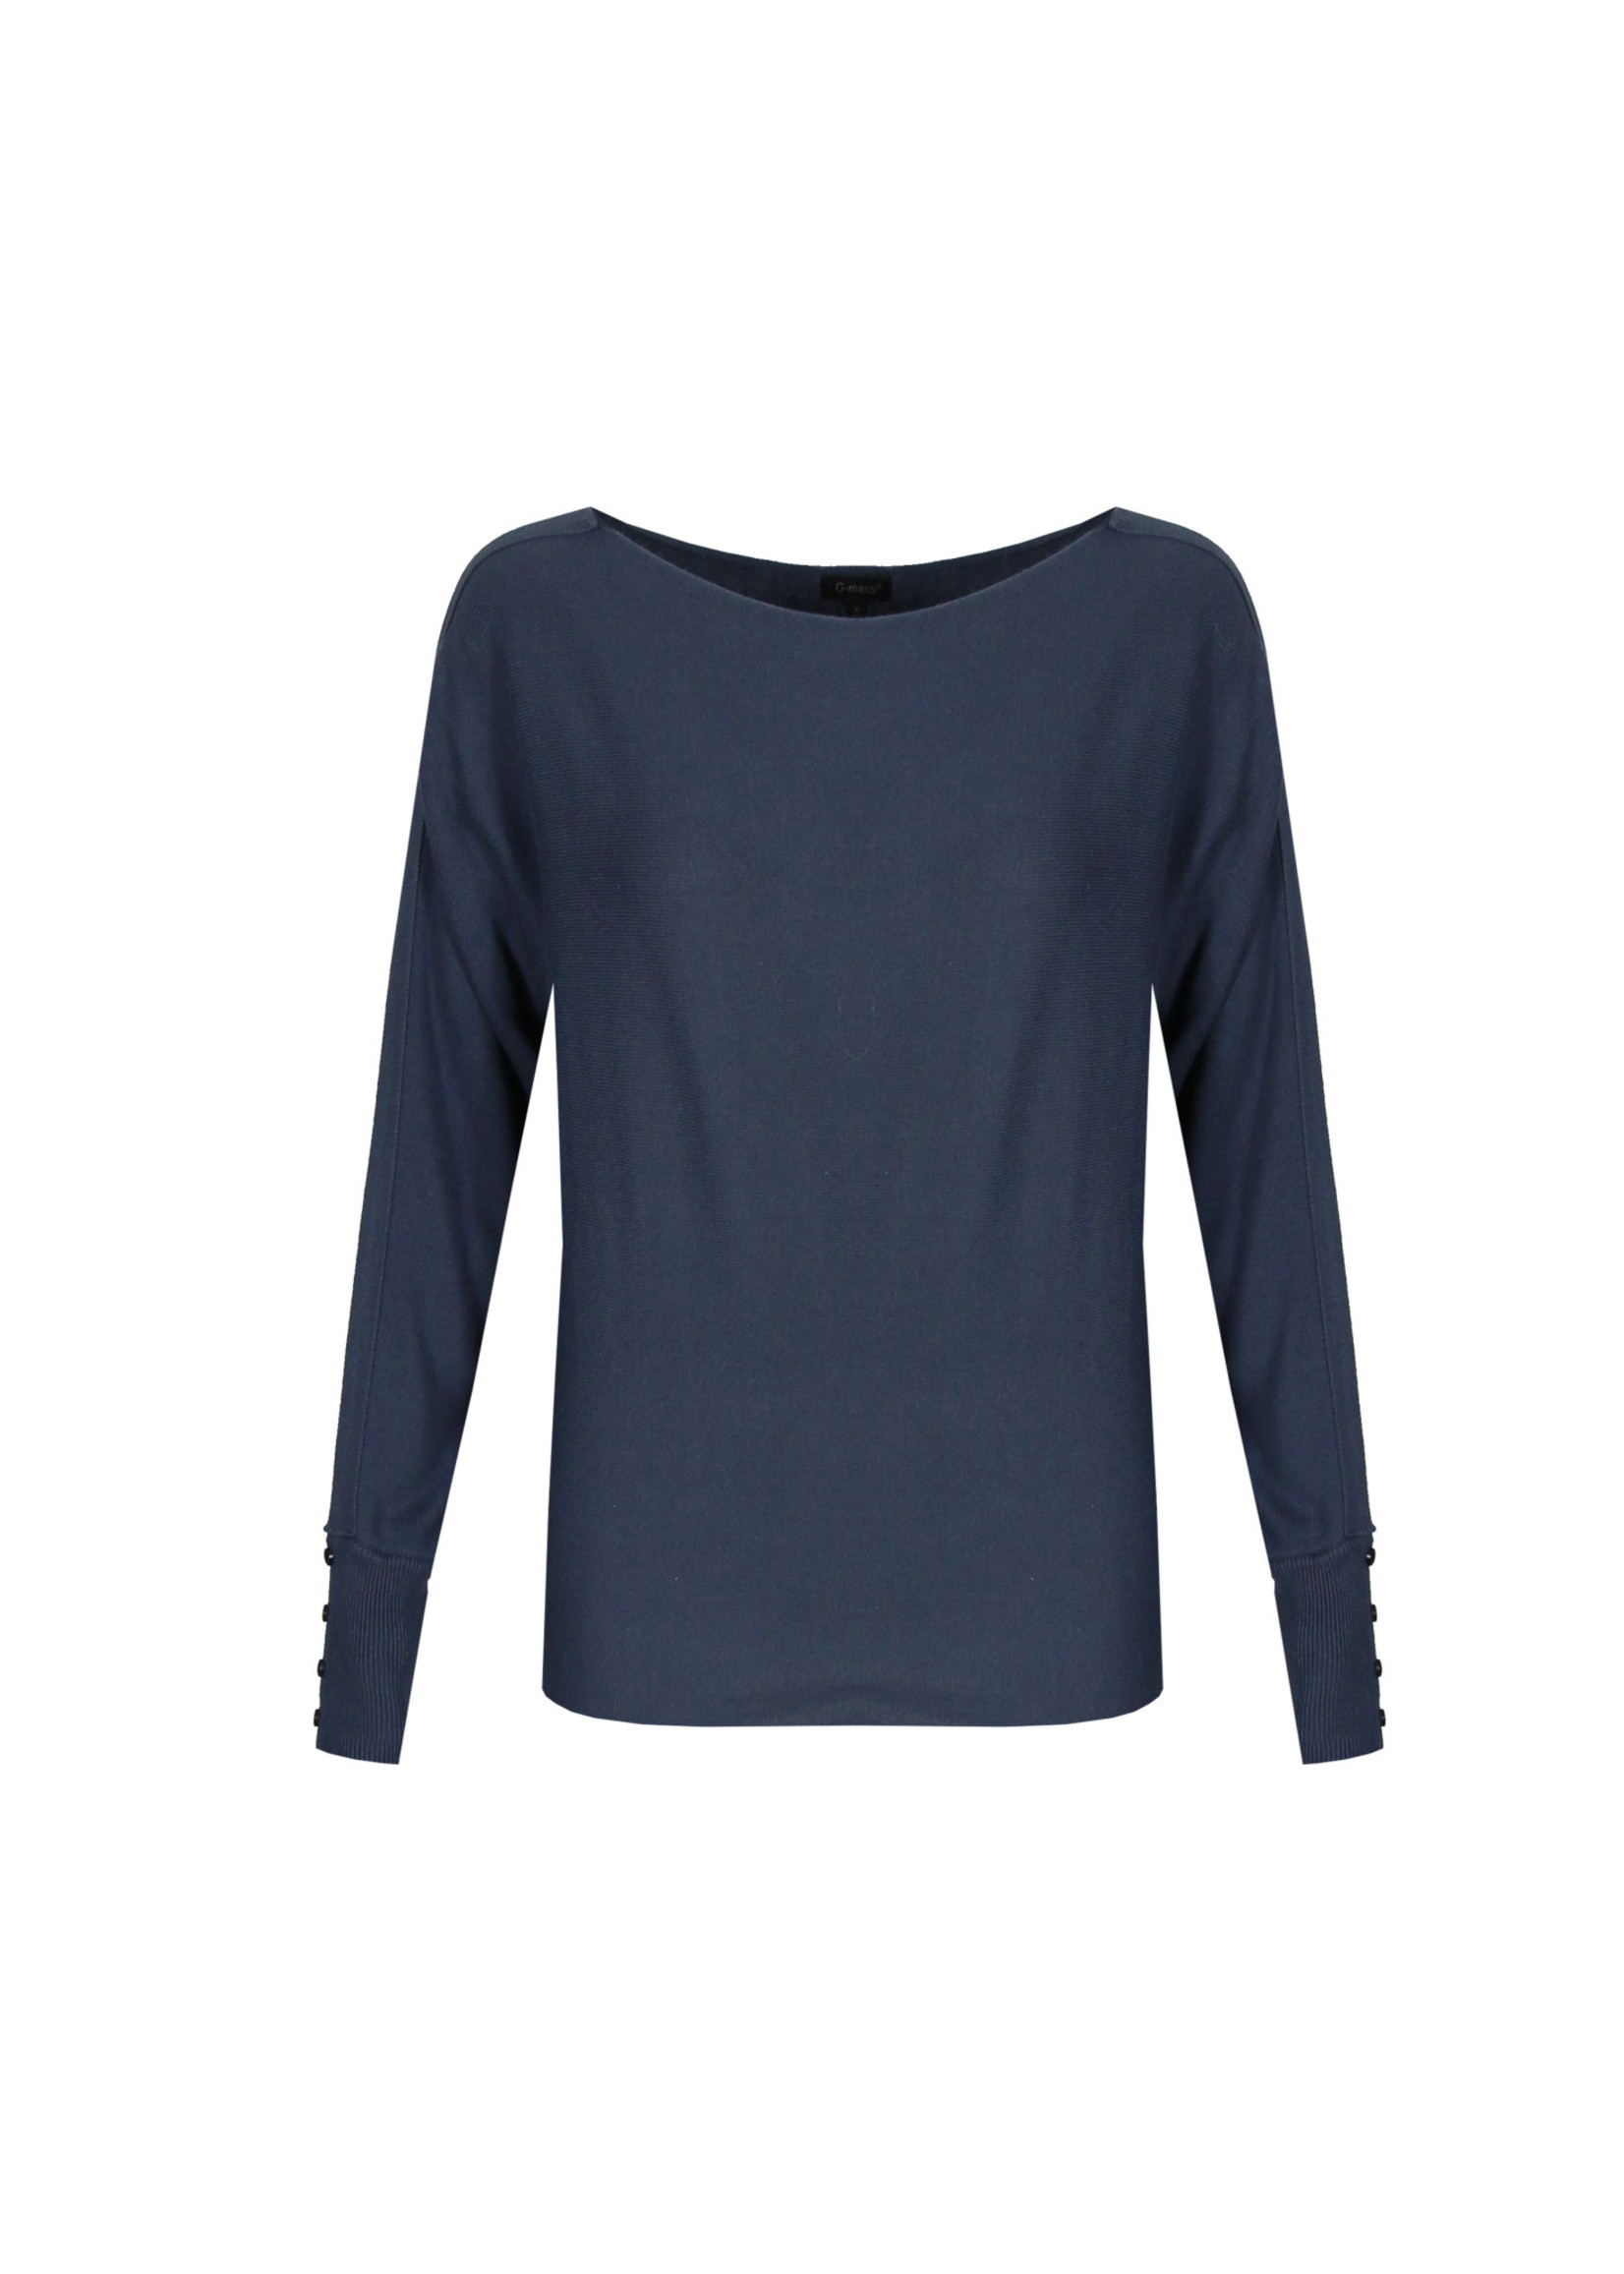 G-Maxx G-maxx - Dalia trui - Jeansblauw